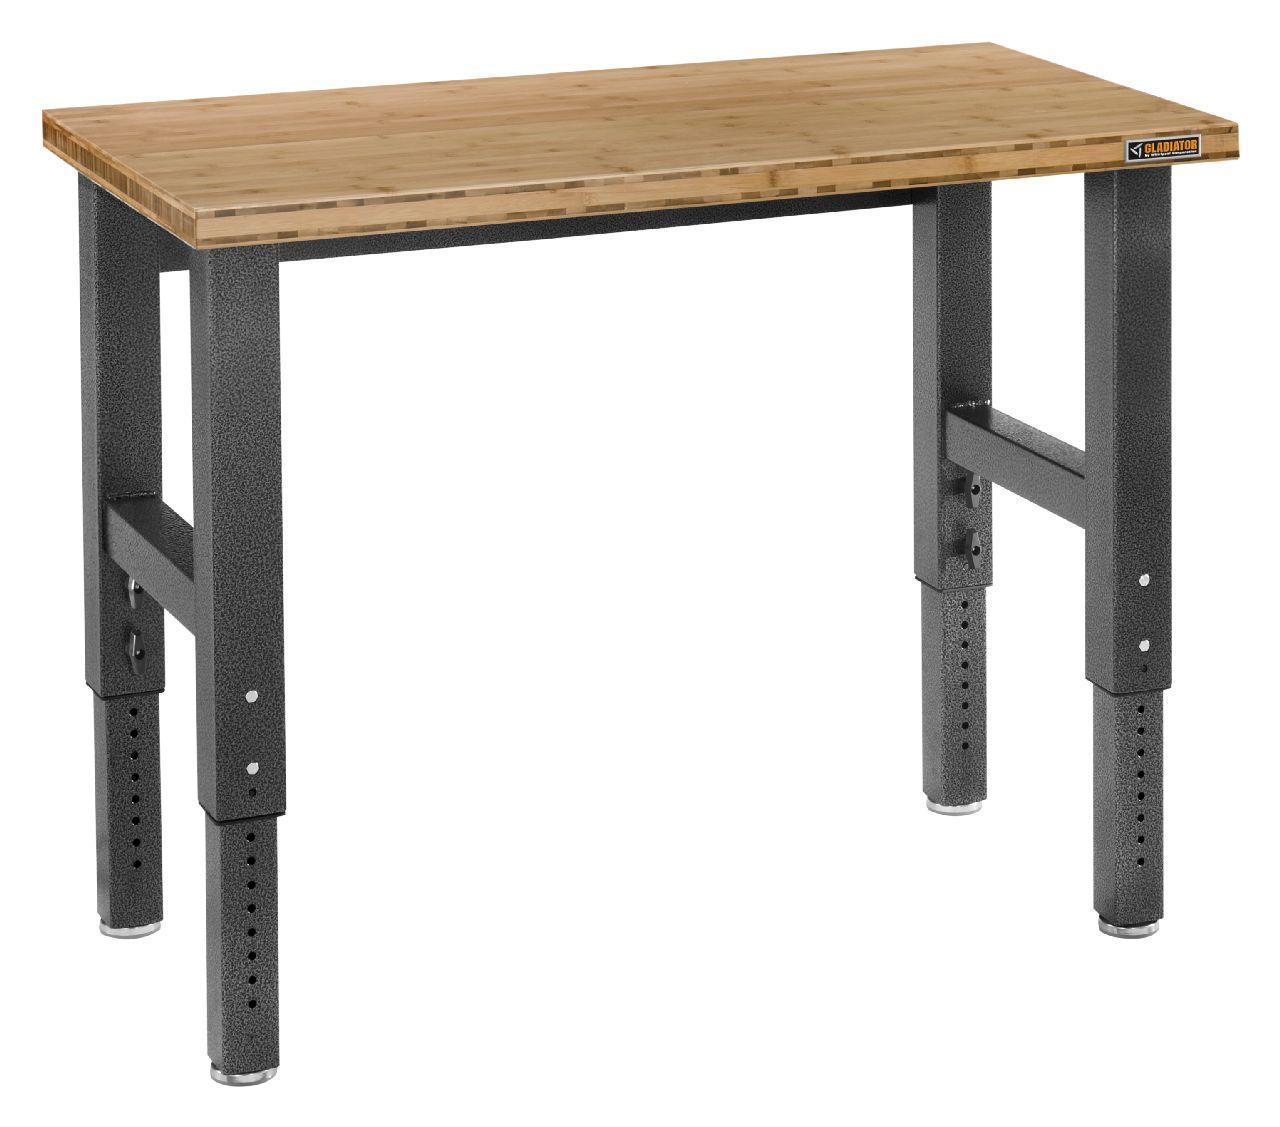 4 Ft Hardwood Top Adjustable Height Workbench In Hammered Granite Gladiator 4 Ft Hardwood Top